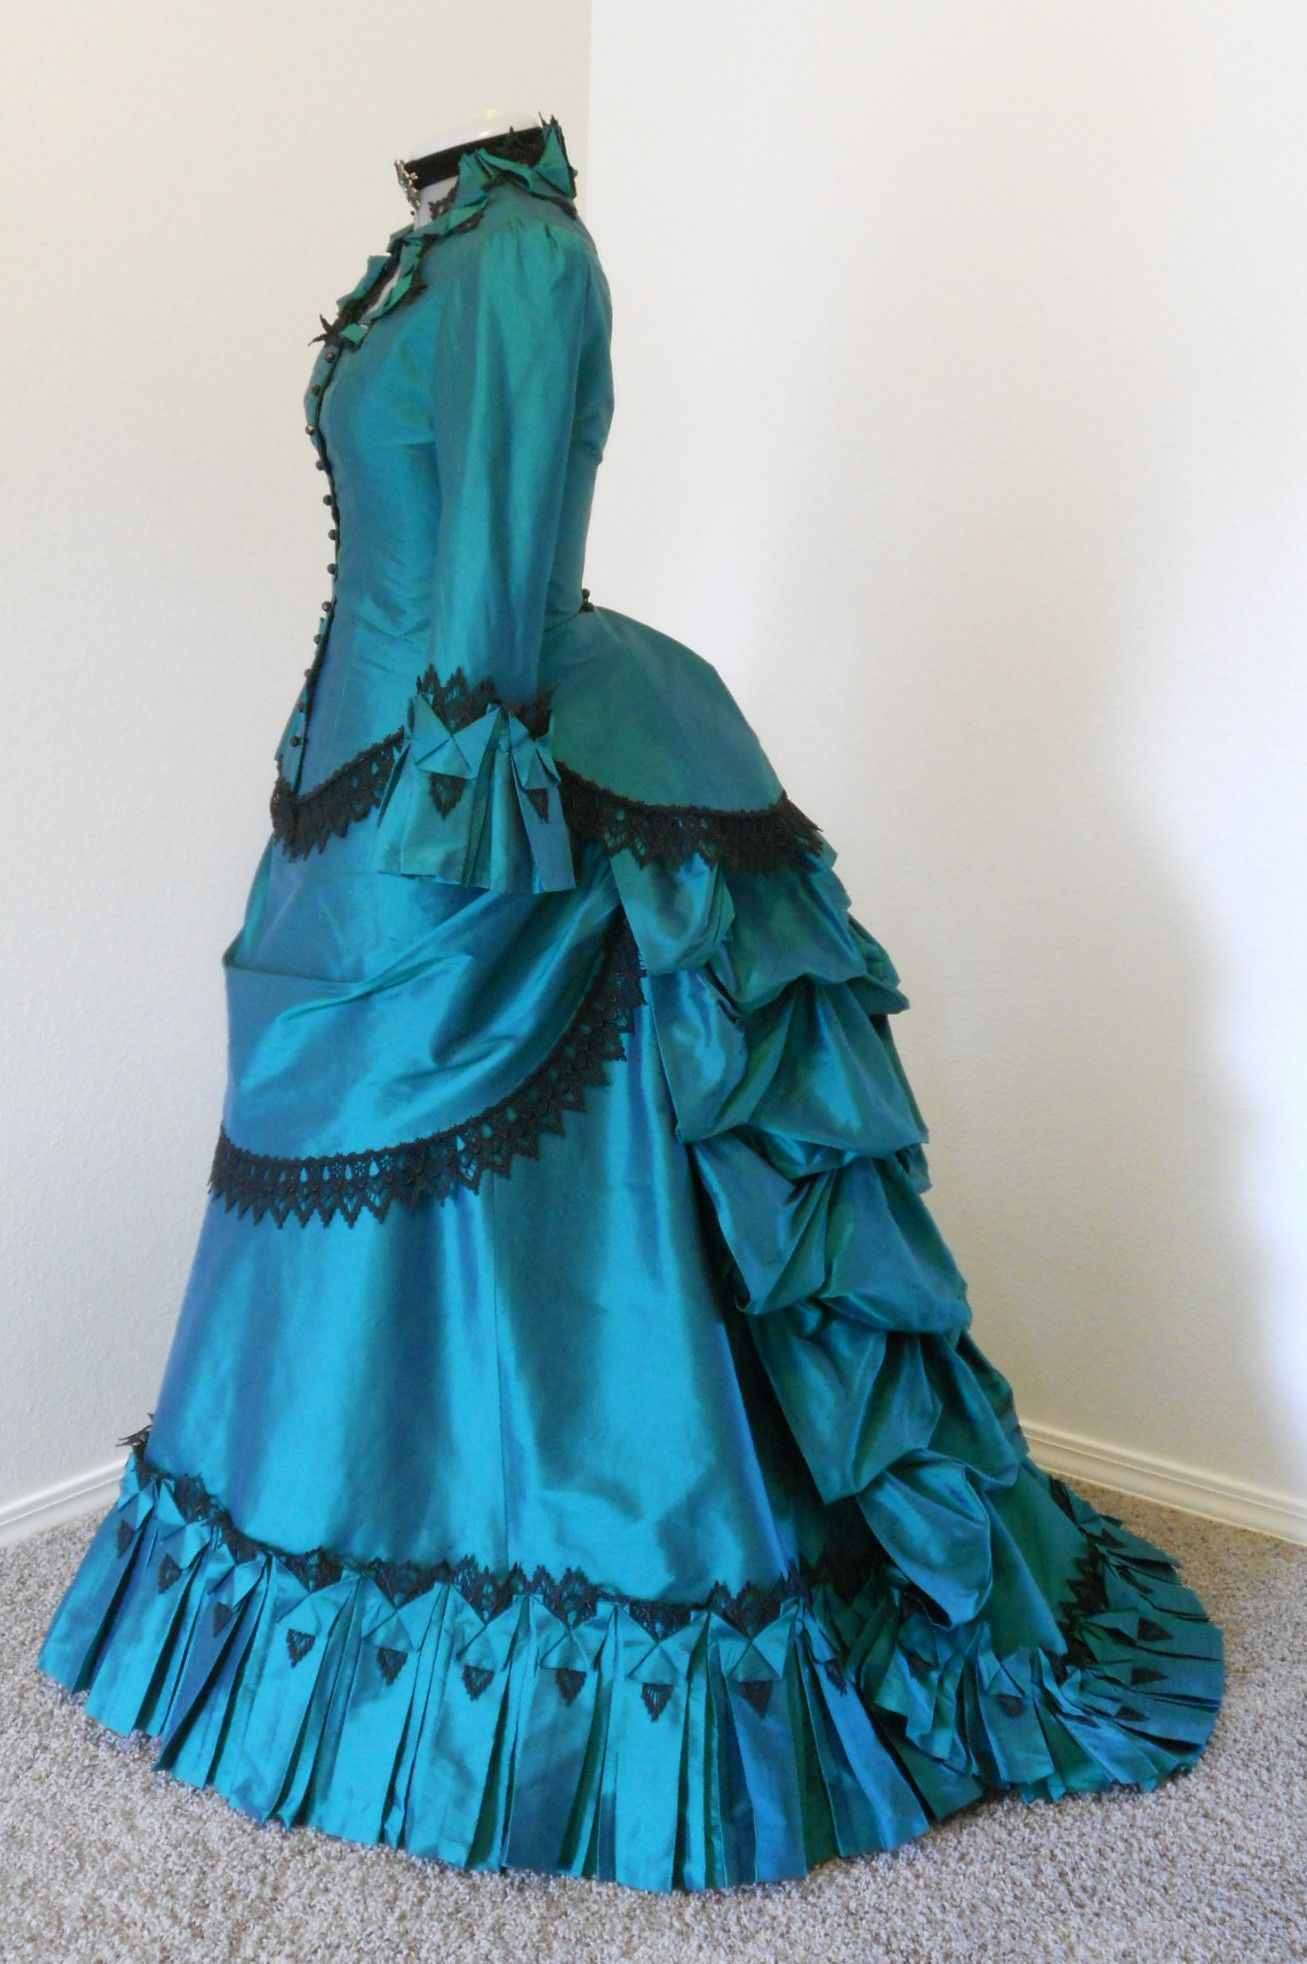 Innovative Bustle Dress Victorian Style Dresses Short Victorian Style Dresses 2016 This Is An Original Victorian Bustle Twopiece Dress Sally C Designs Dress Victorian wedding dress Victorian Style Dresses